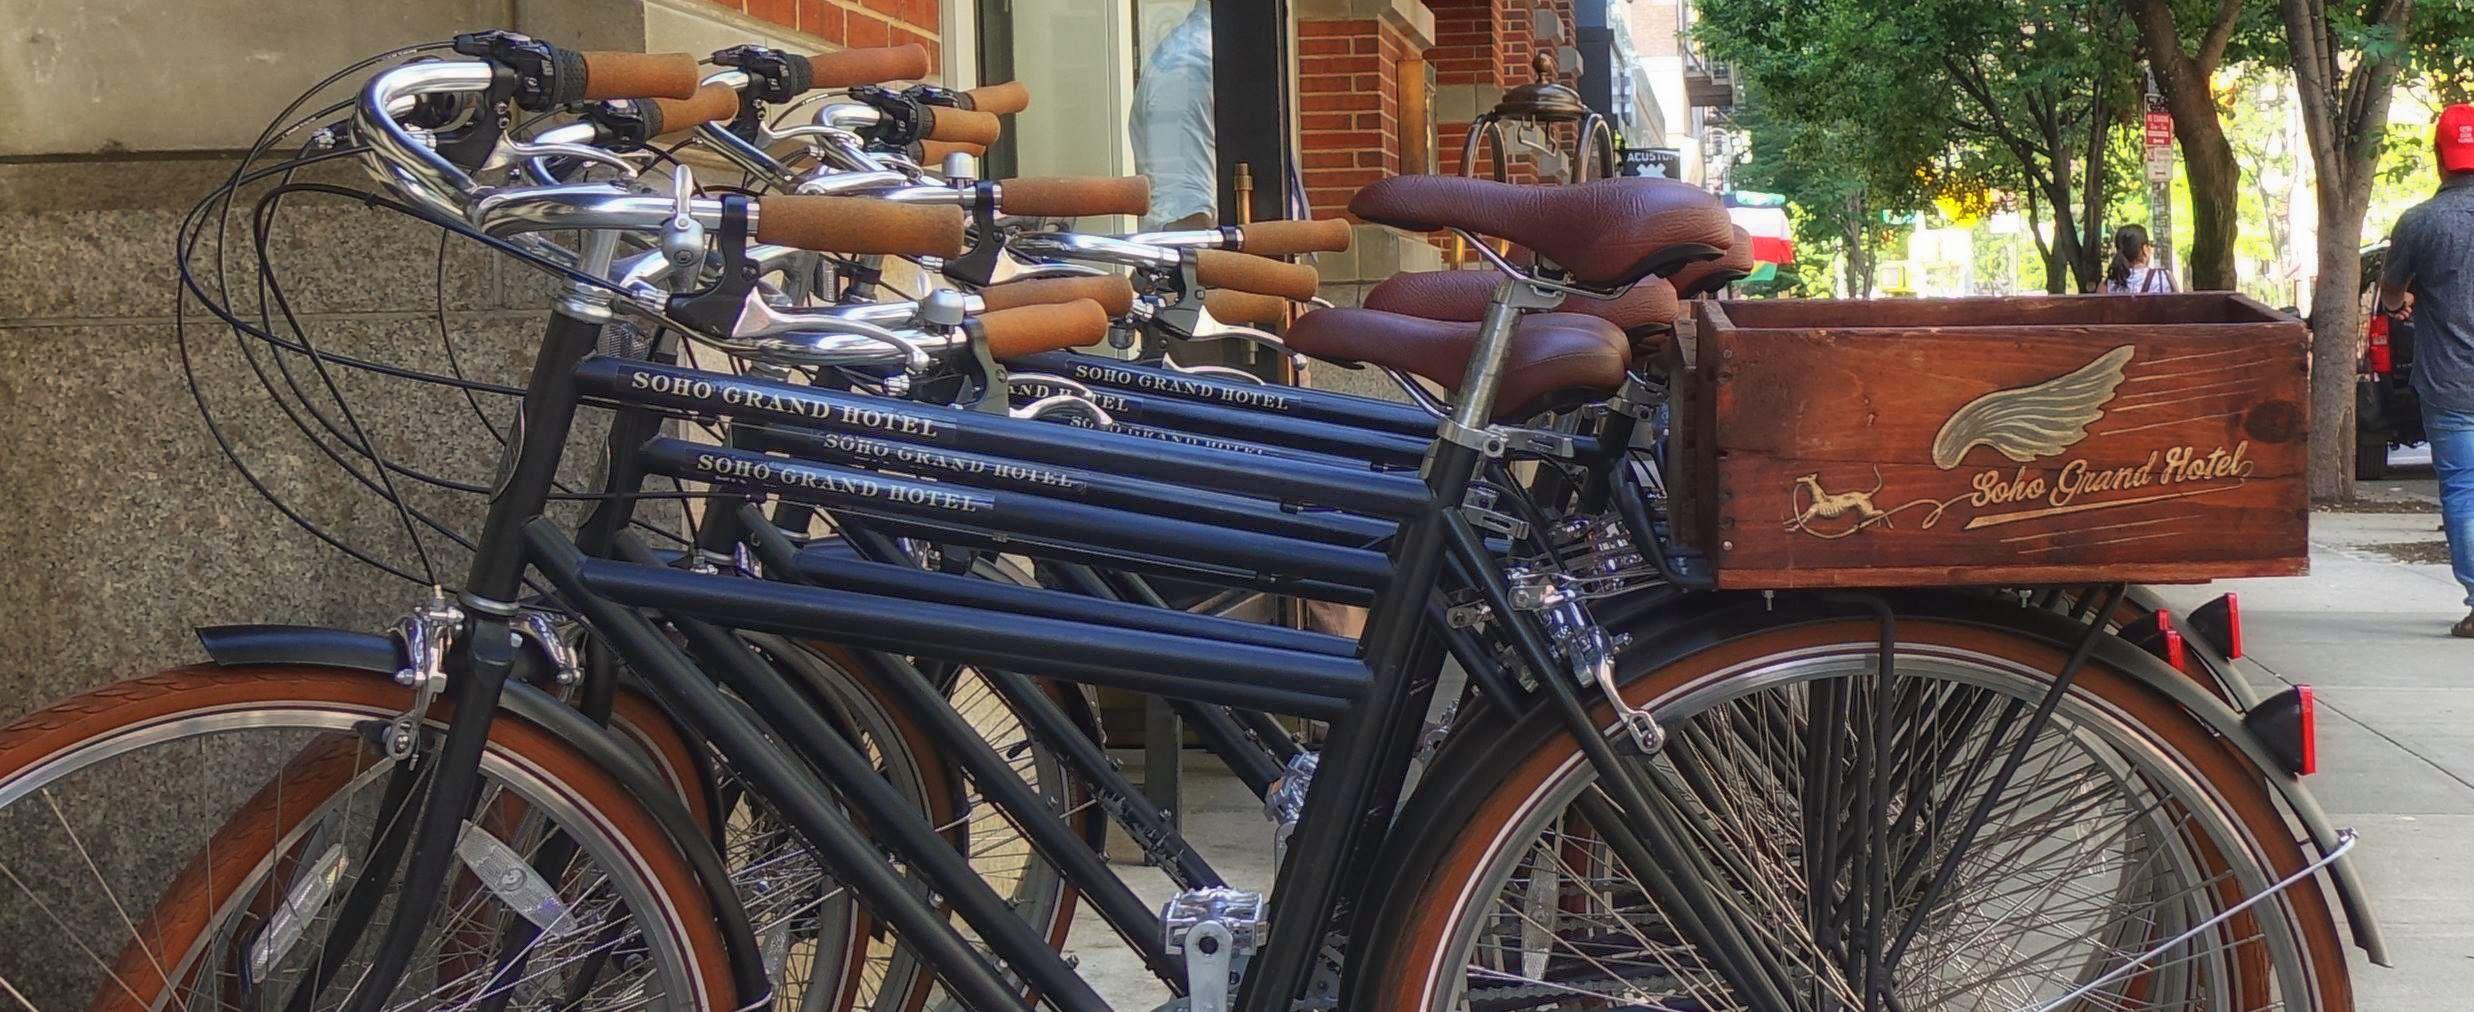 cool-bikes-soho-hotel.jpg